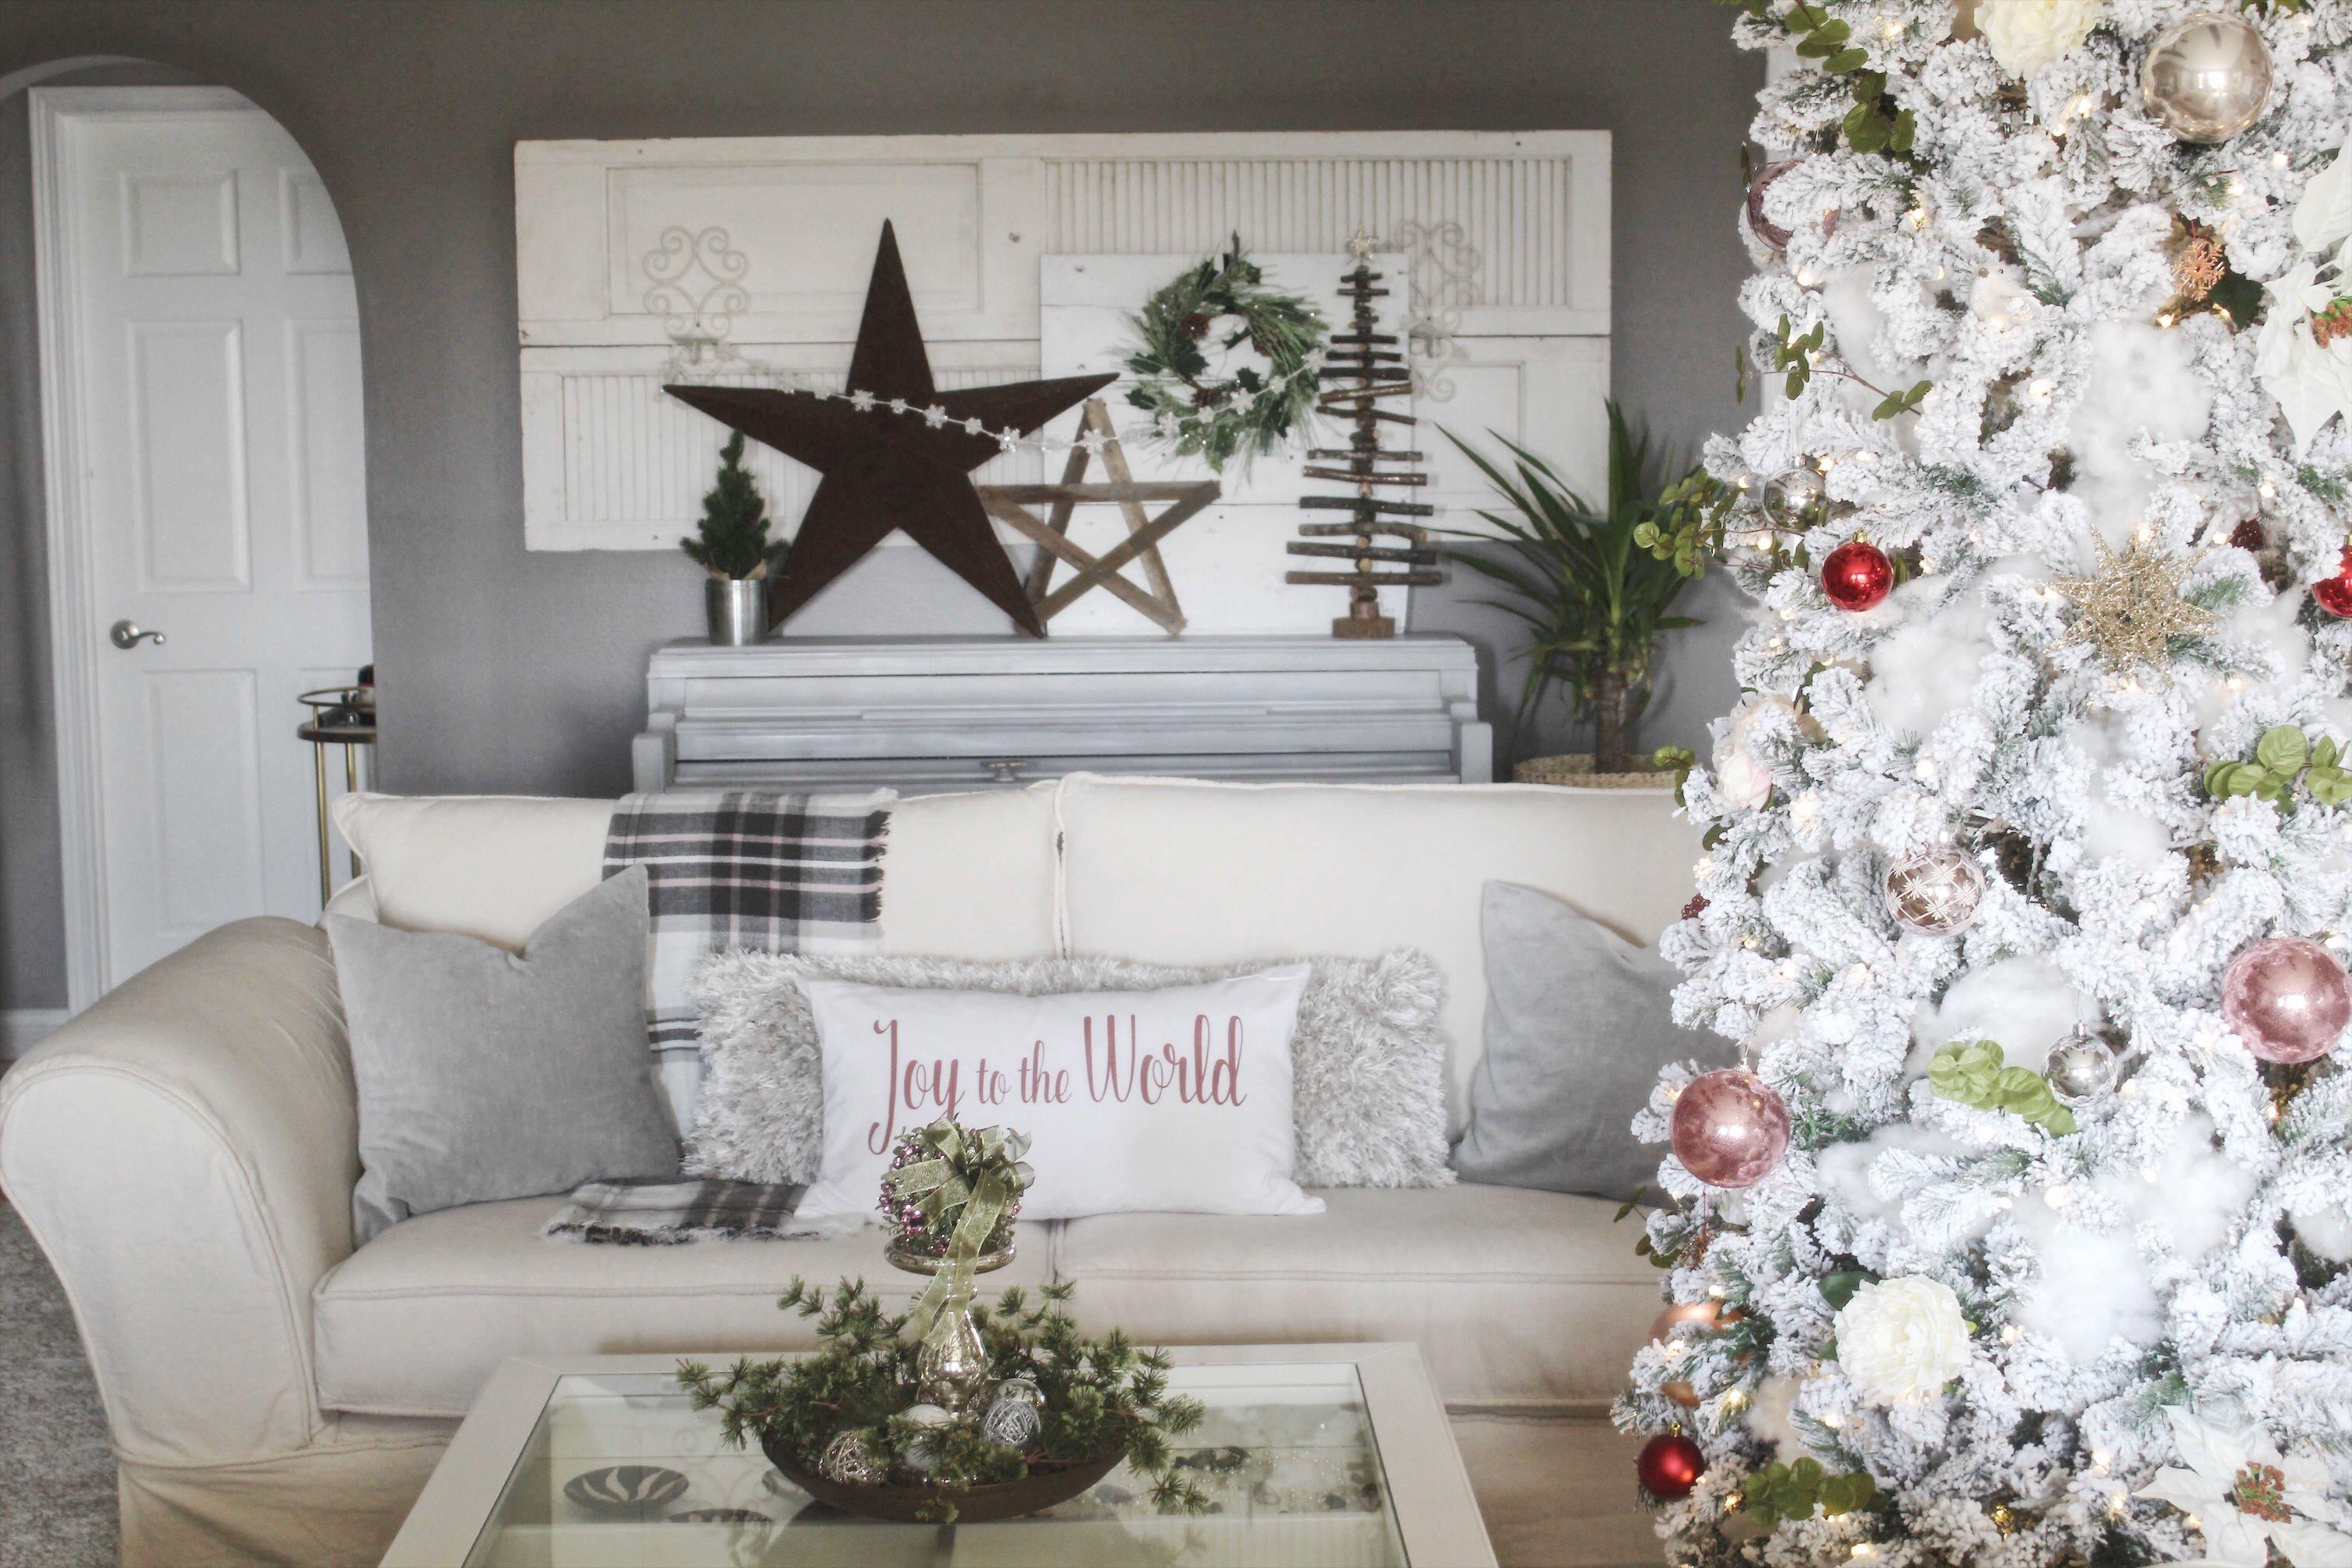 Christmas decor for open shelf in living room | Christmas Home Tours ...